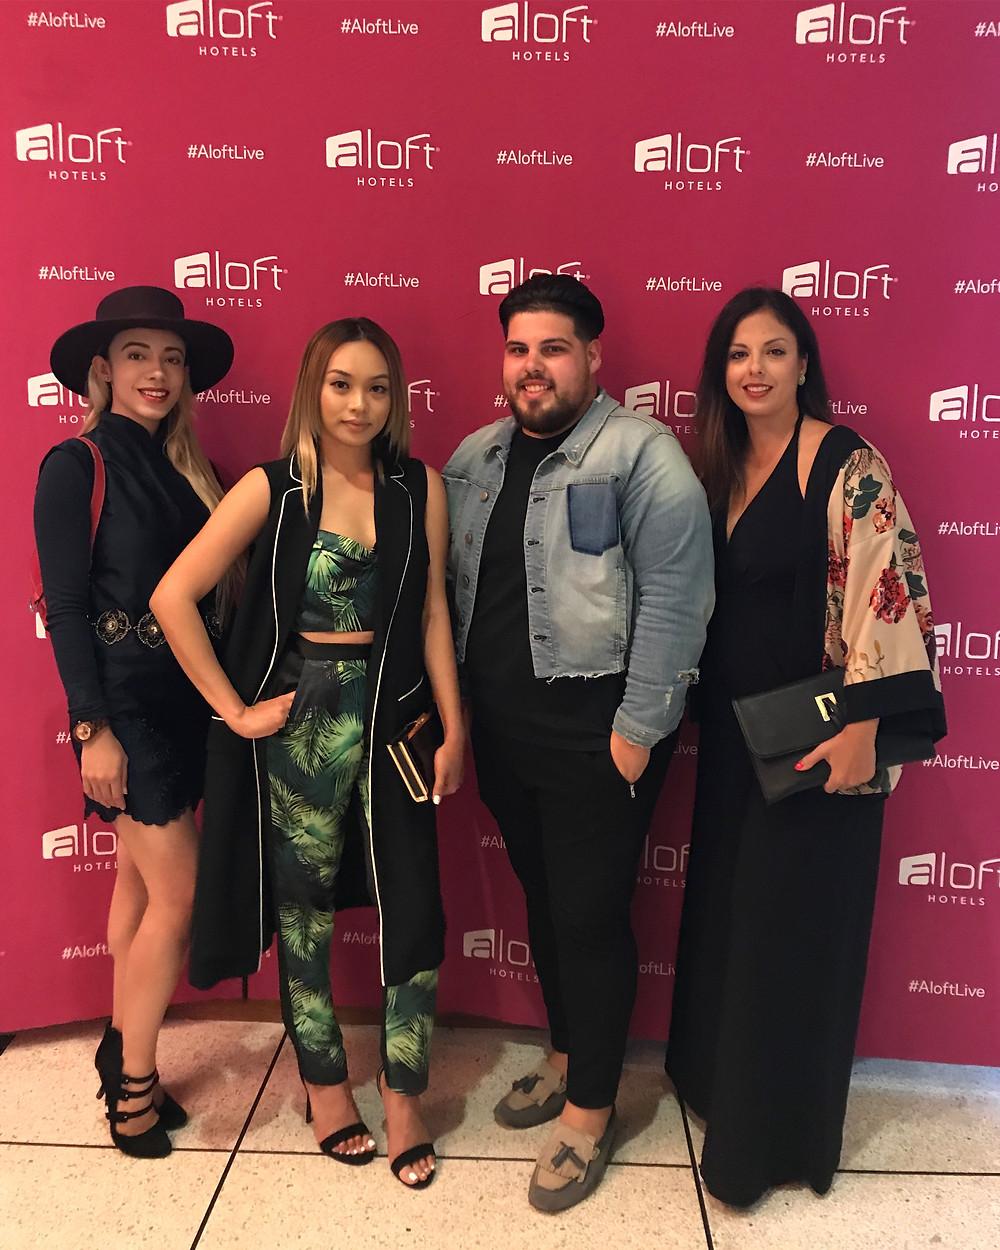 Orlando-Fashion-Bloggers-Aloft-Orlando